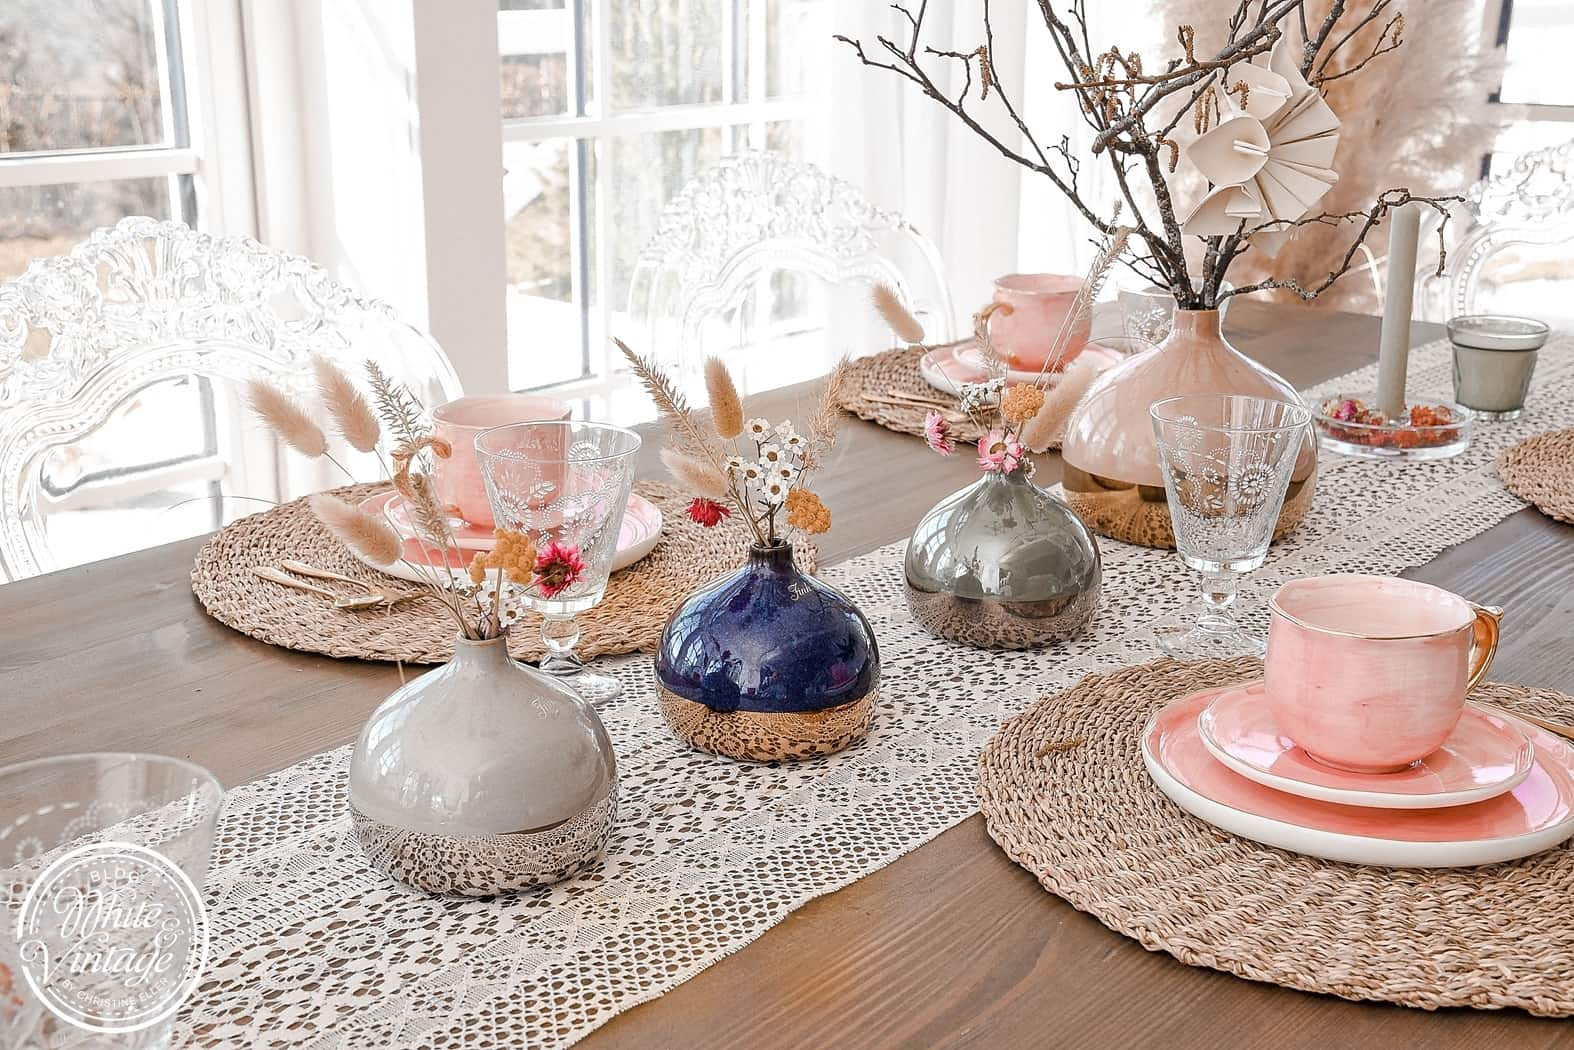 Vasen frühlingshaft dekorieren.